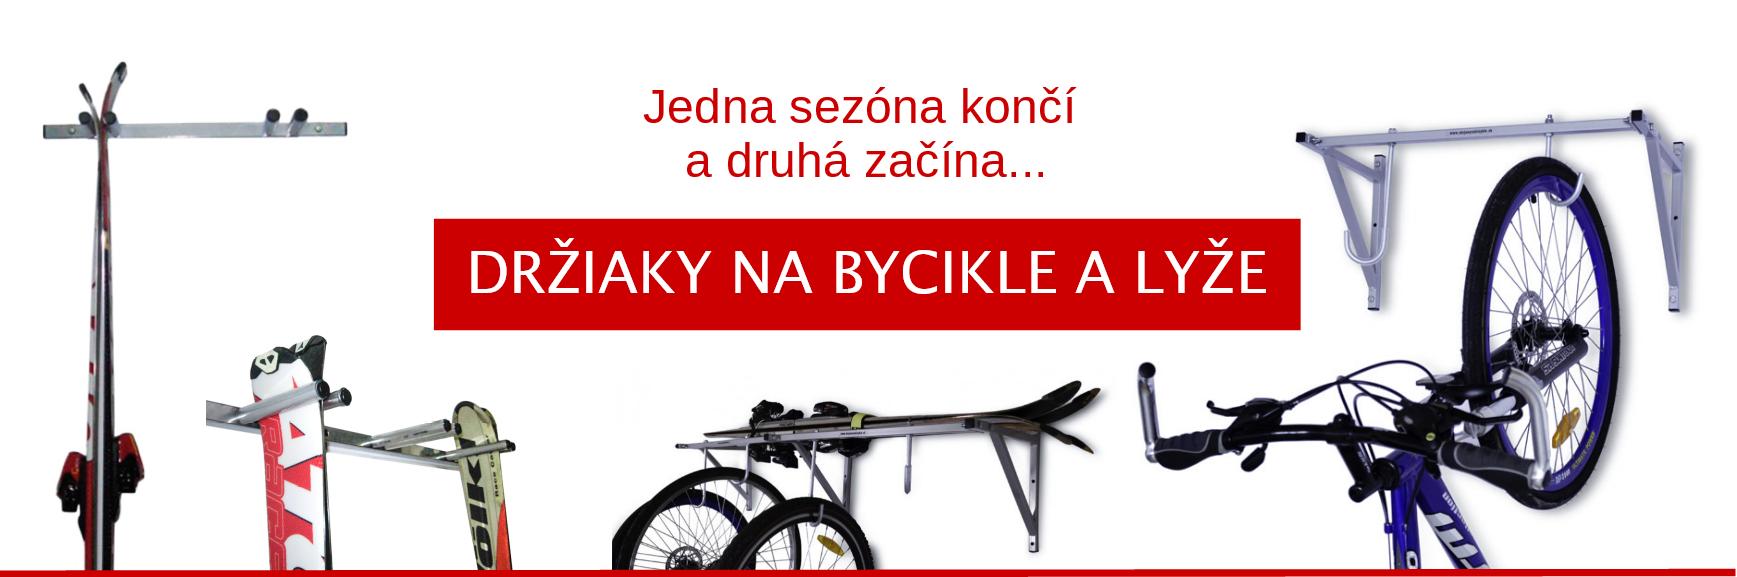 Držiaky na bicykle a lyže